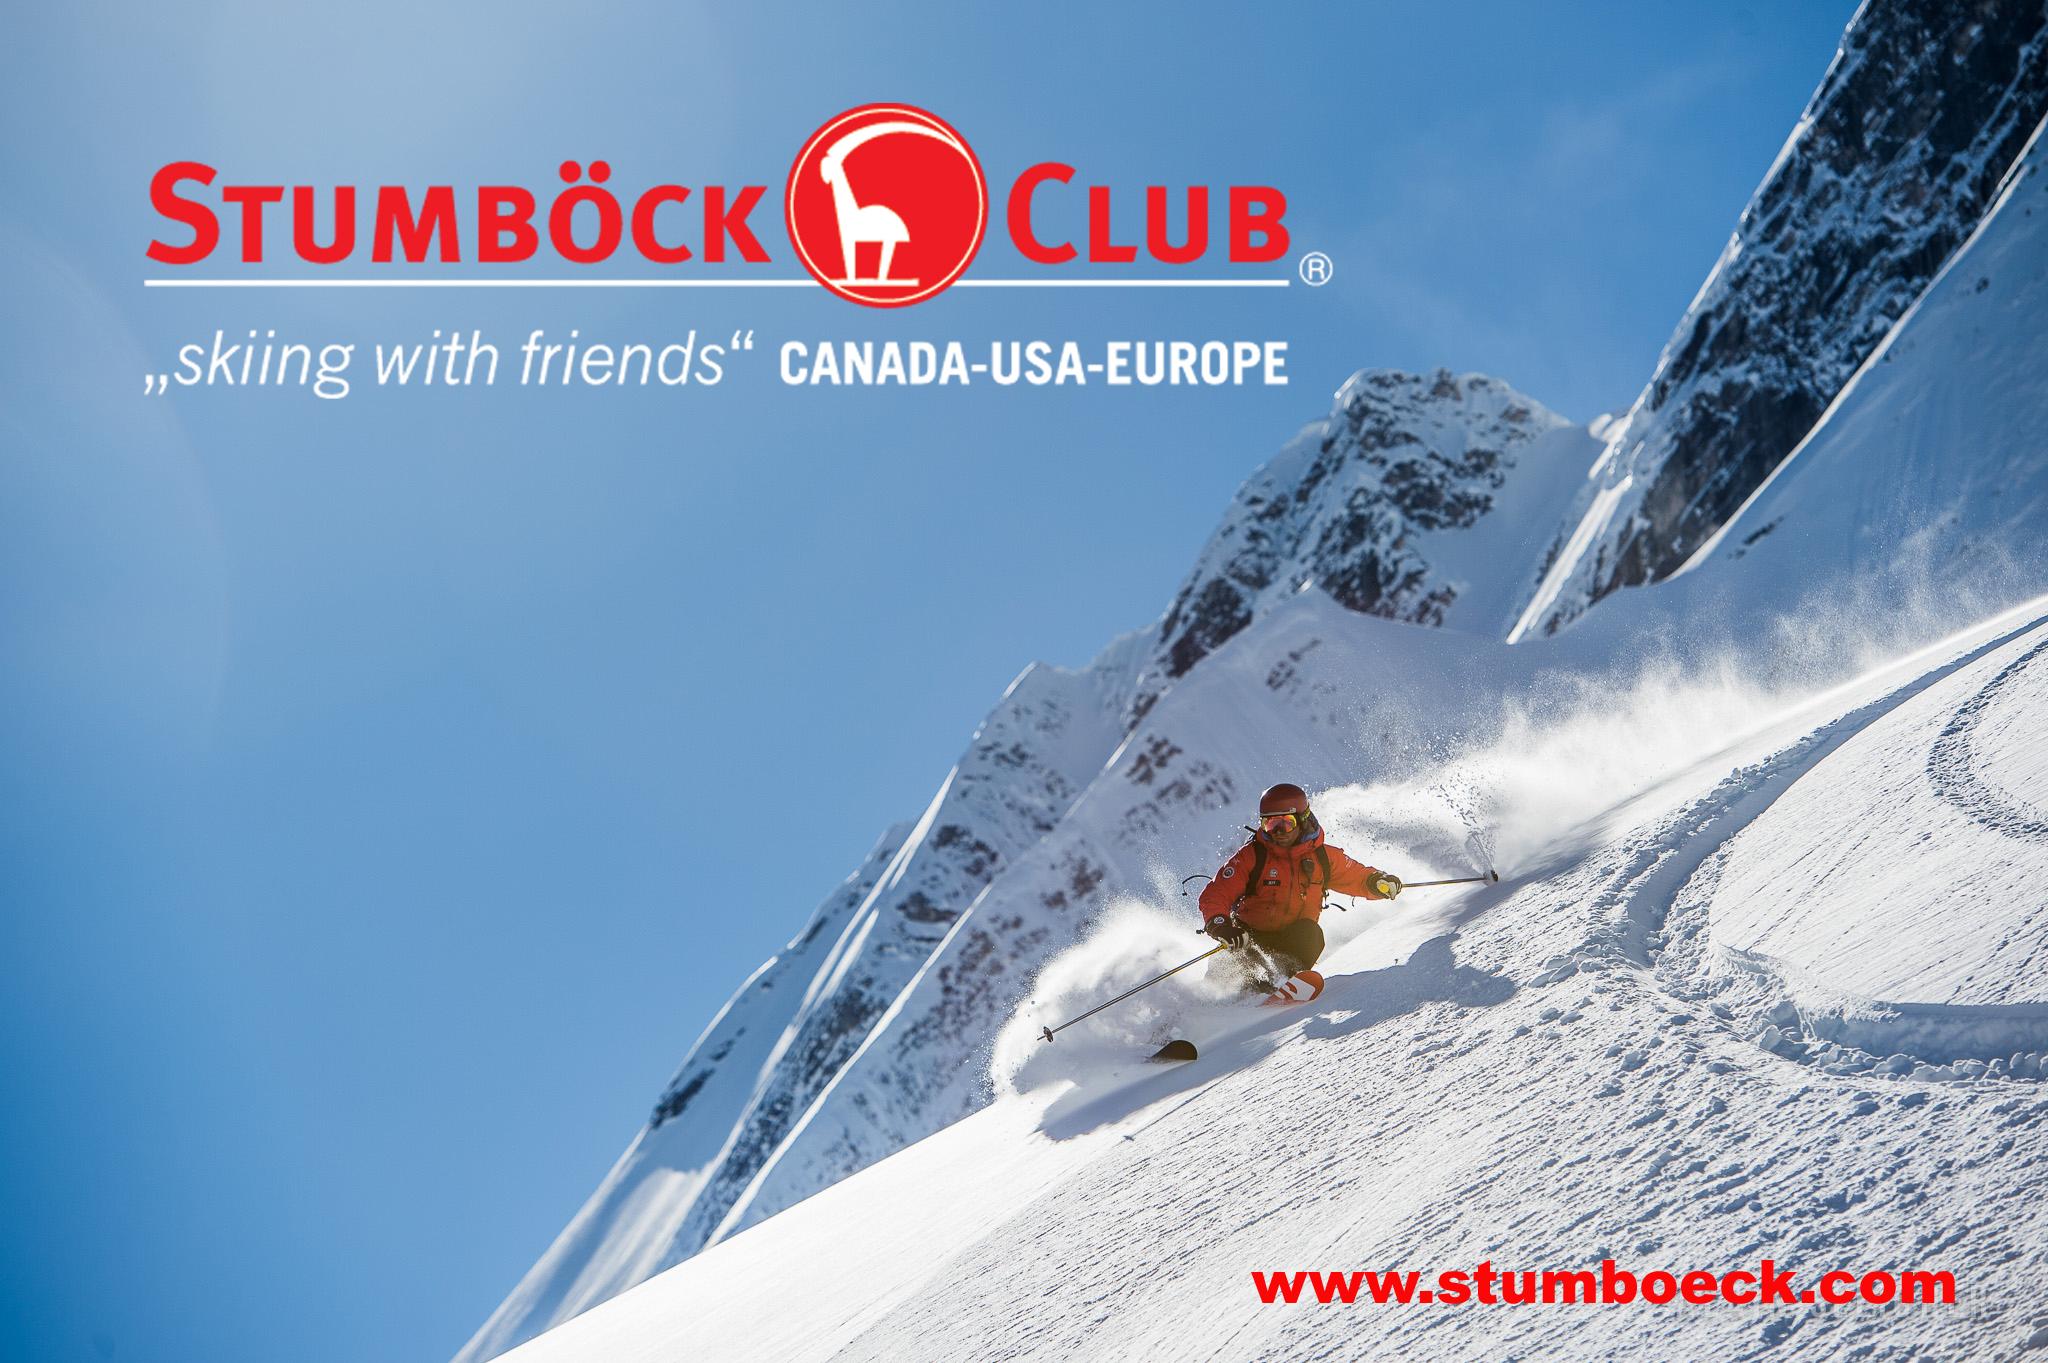 Stumböck Club Reisen